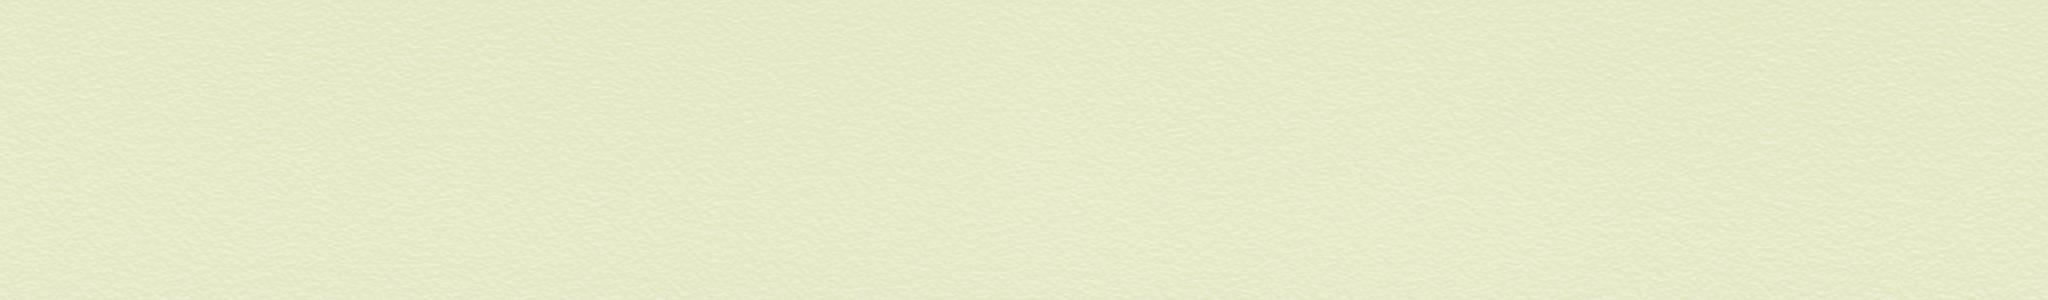 HU 16617 Chant ABS Vert Perle XG